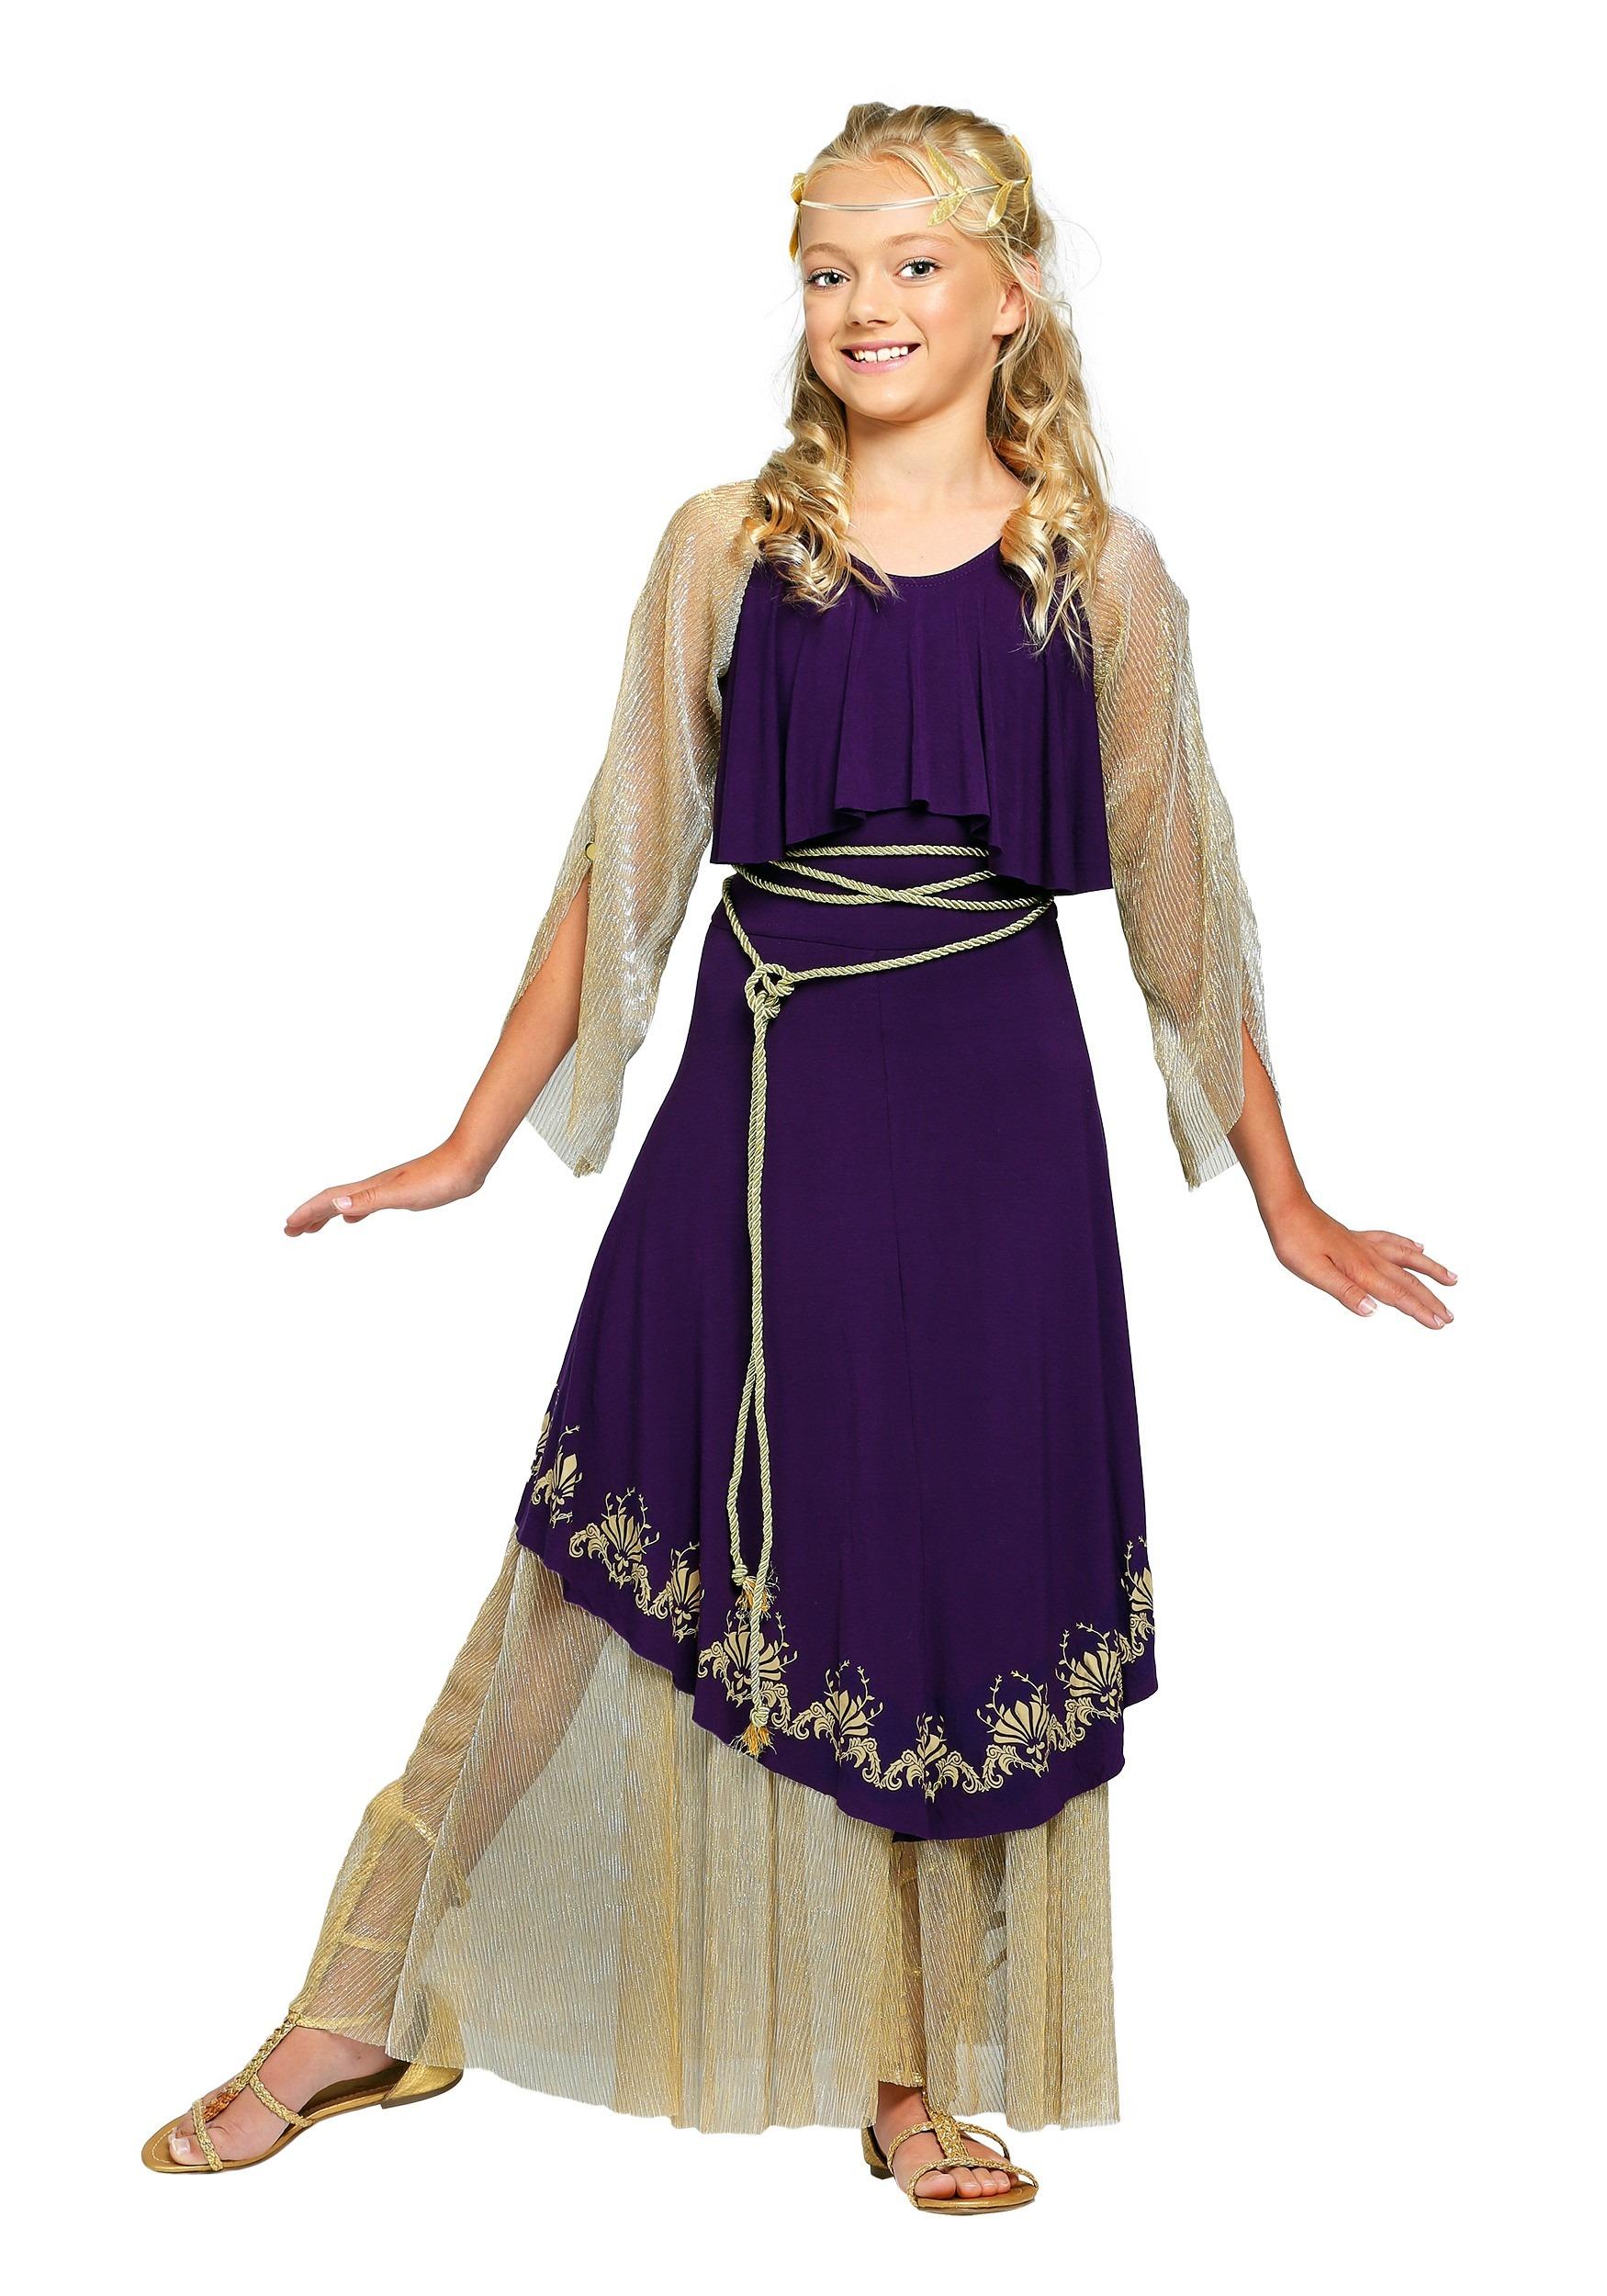 Aphrodite Goddess Costume for Girls Aphrodite Greek Mythology Costume